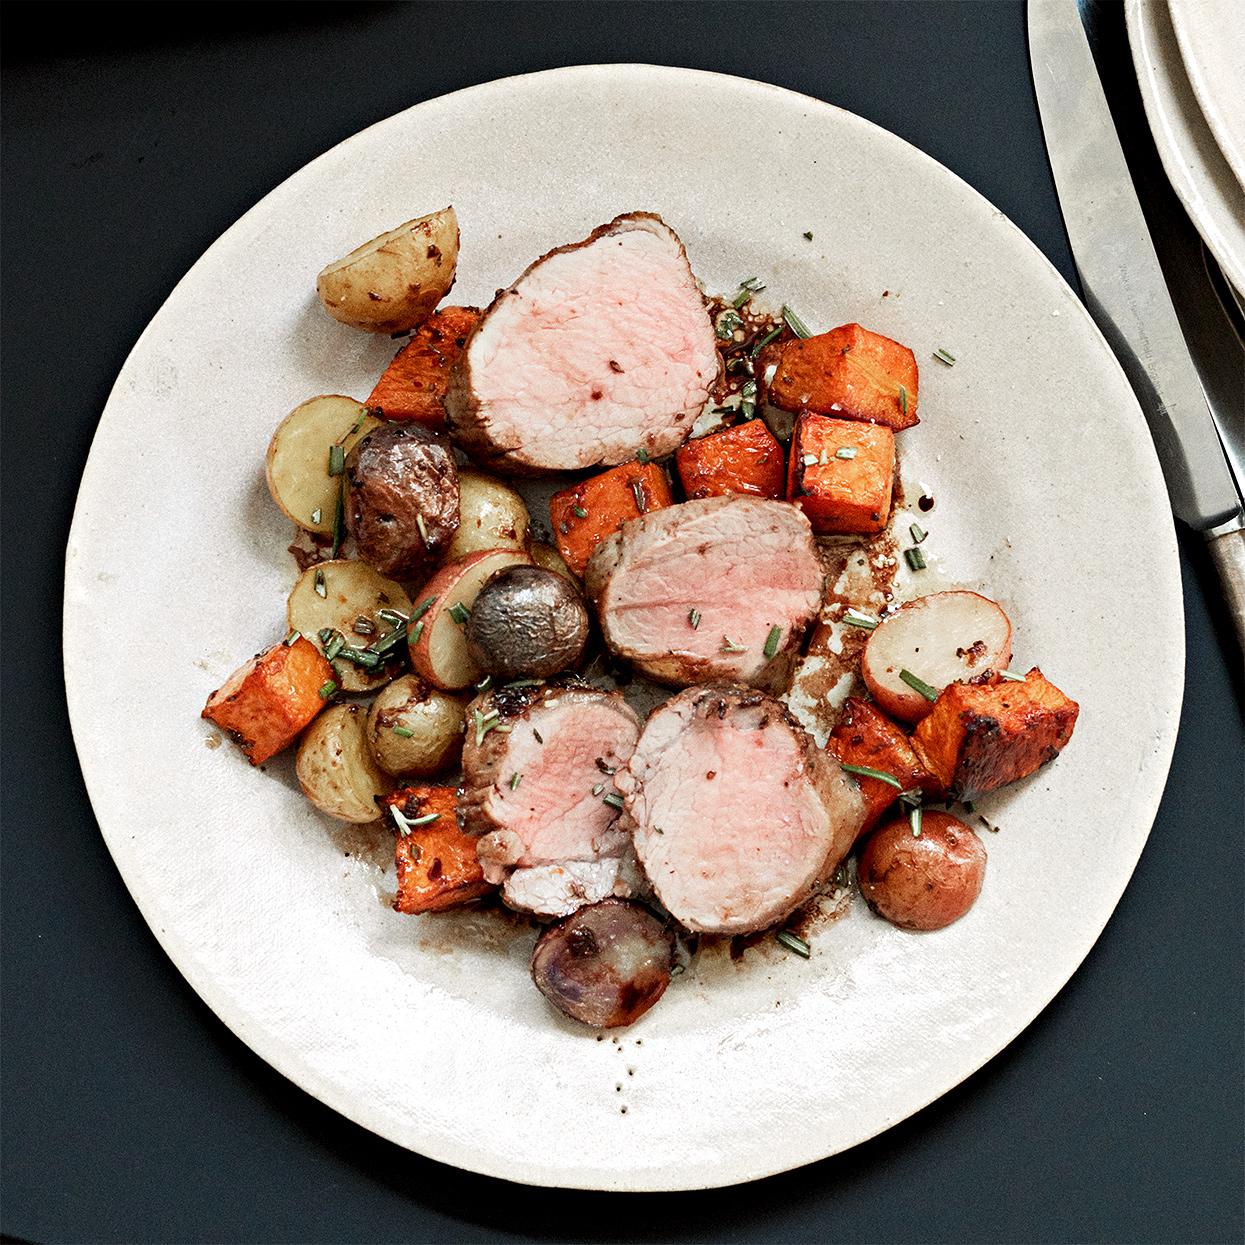 Sheet Pan Pork, Butternut Squash and Potato